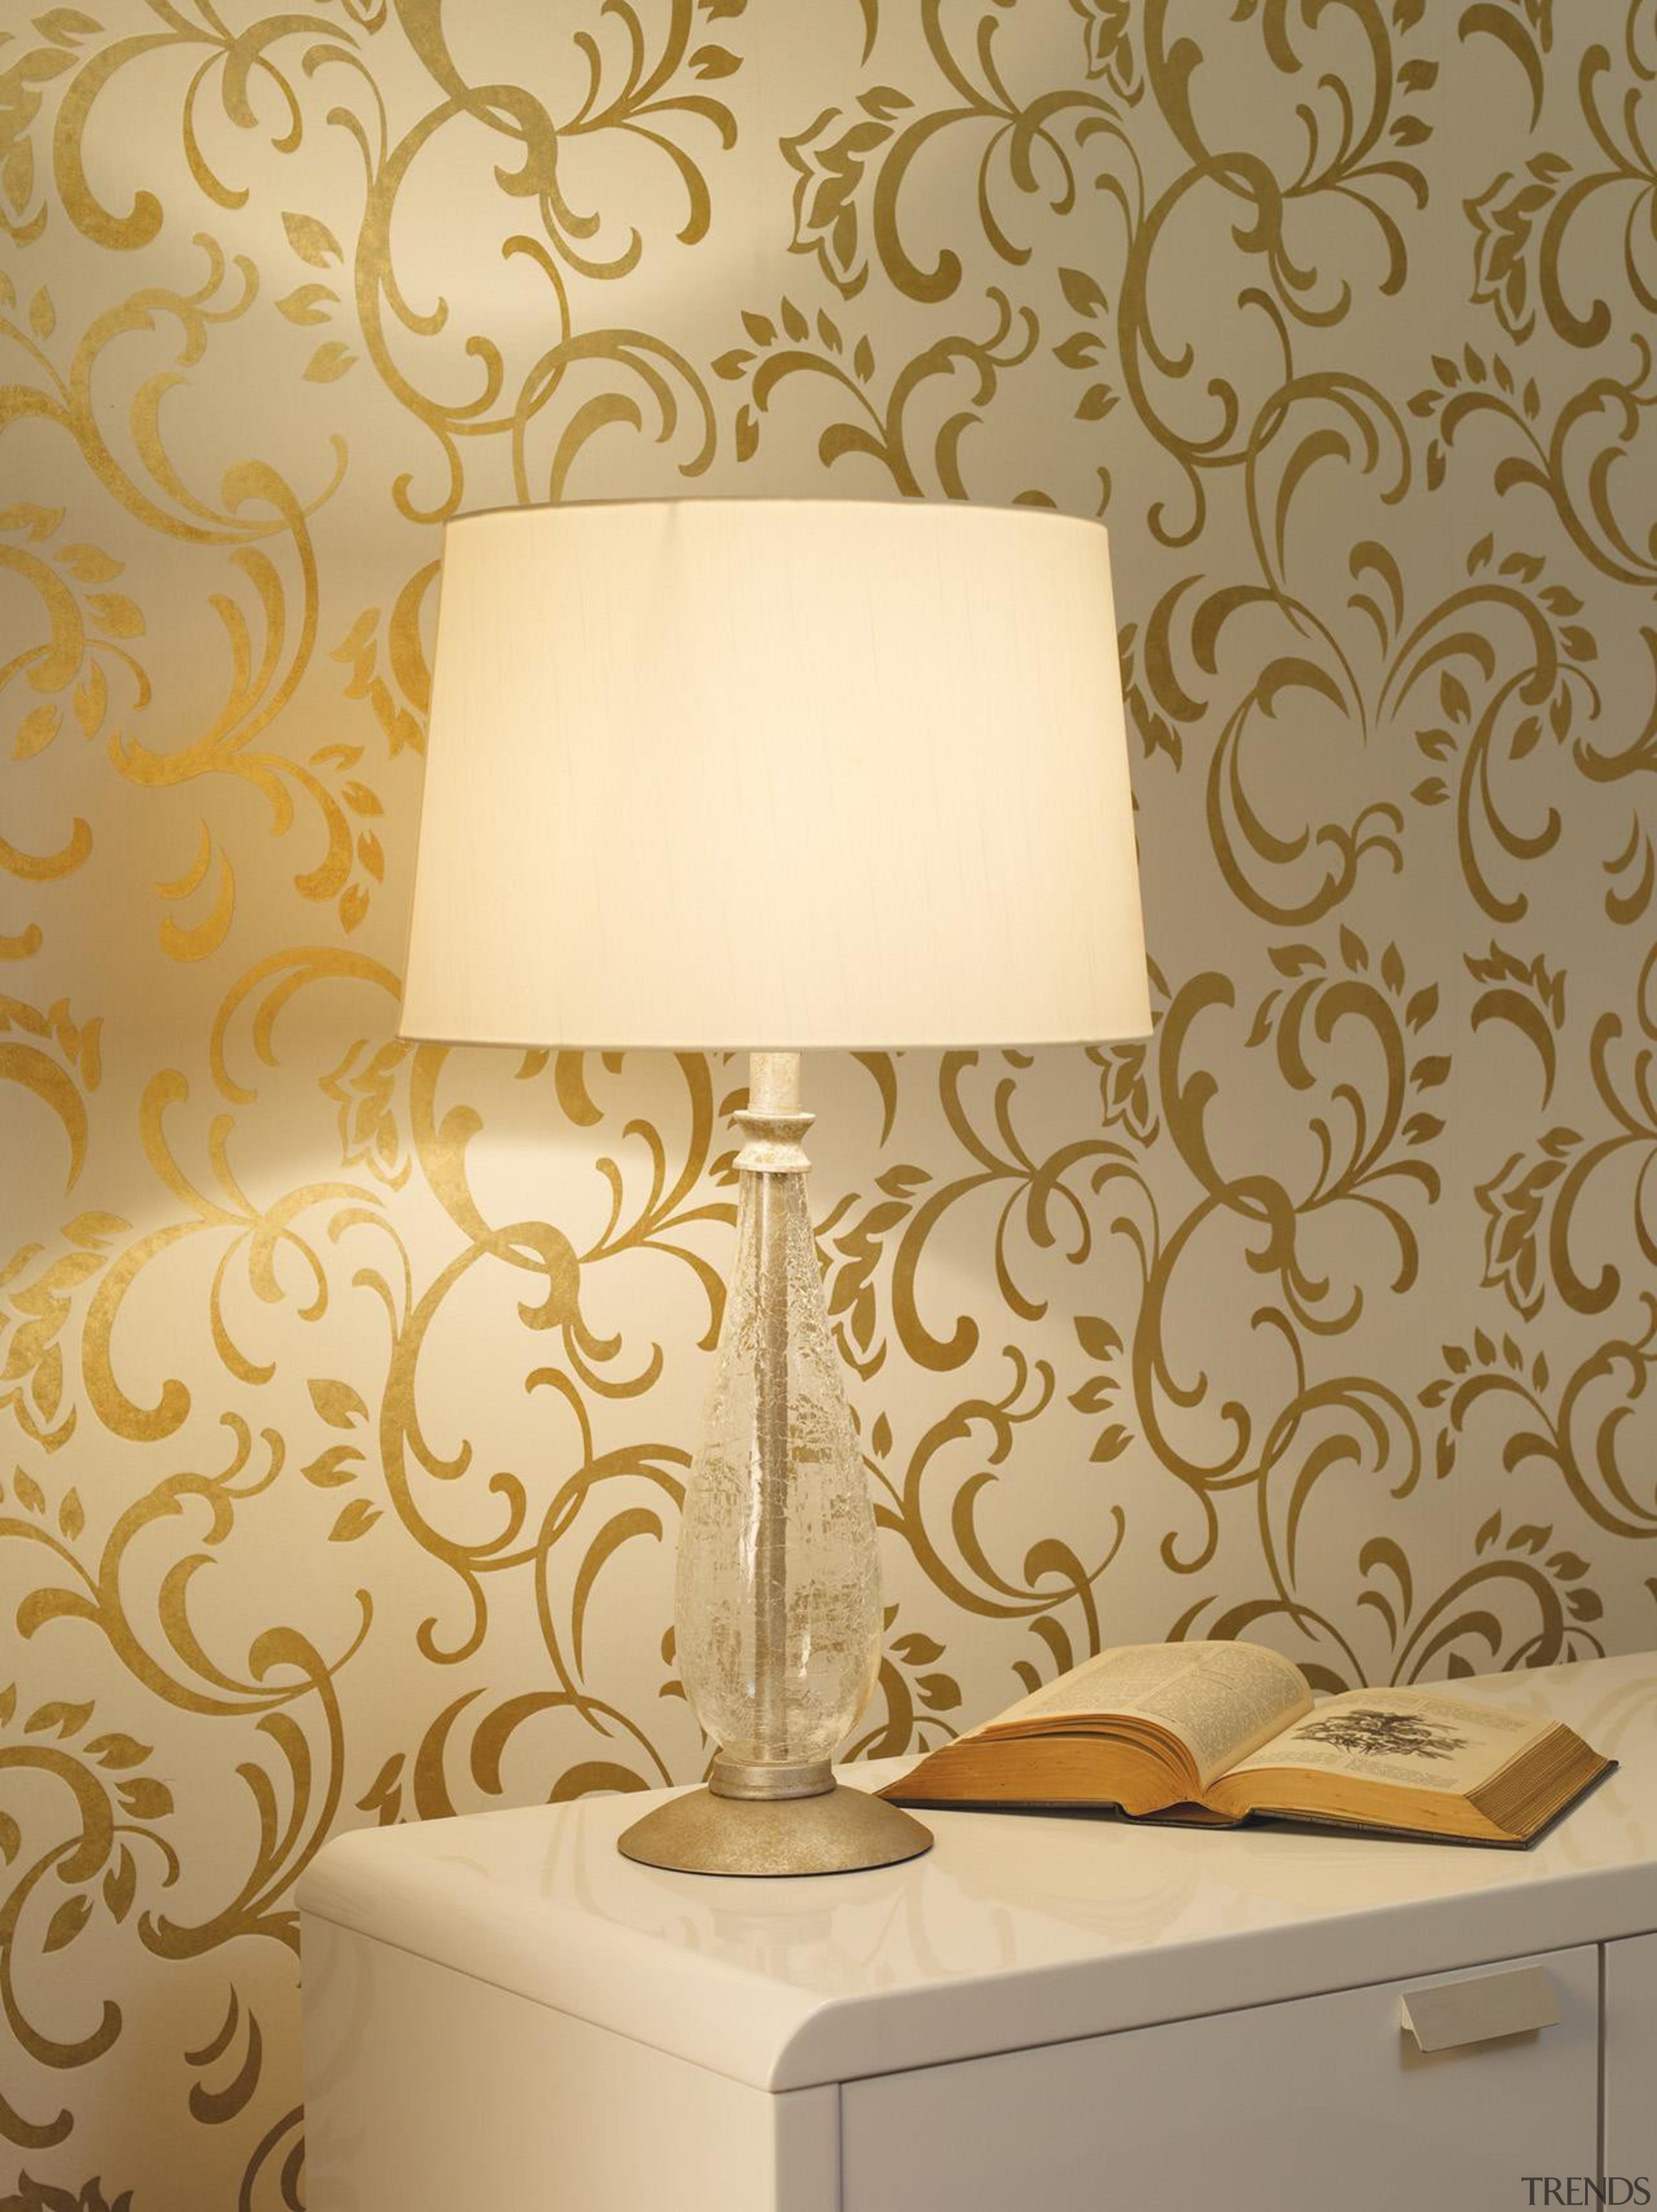 Bloomsbury House - Bloomsbury House Range - ceramic ceramic, interior design, lamp, lampshade, light fixture, lighting, lighting accessory, wall, wallpaper, orange, brown